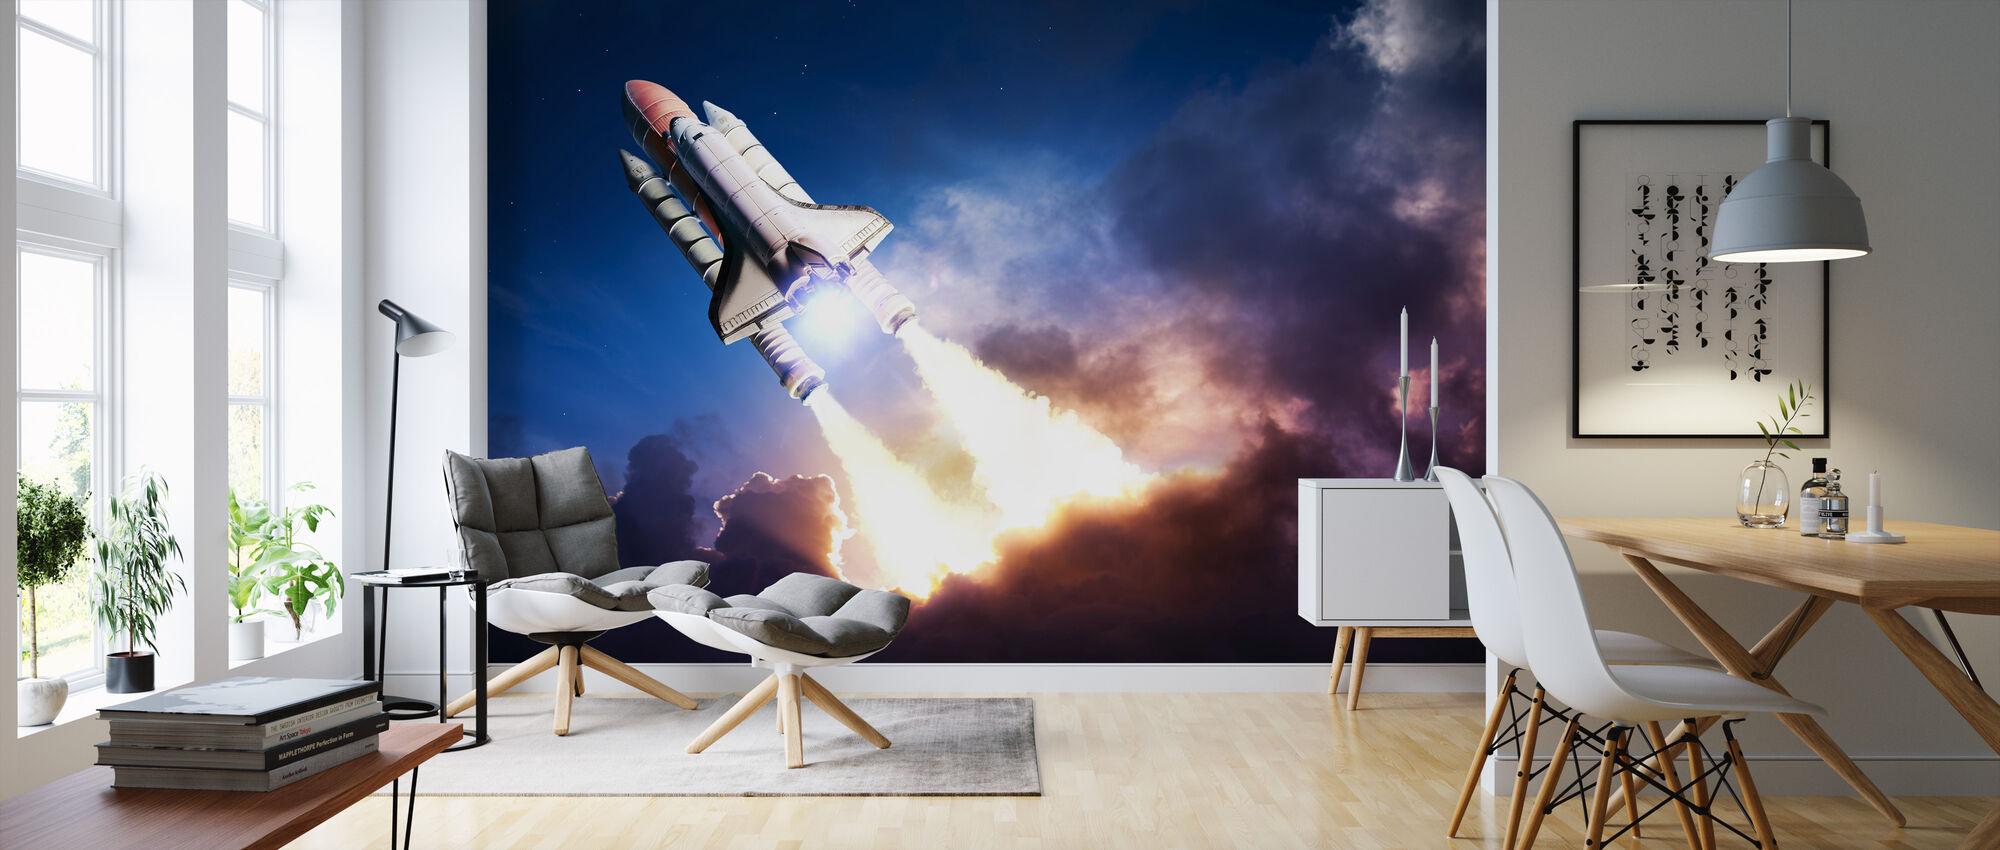 Space Adventure - Wallpaper - Living Room